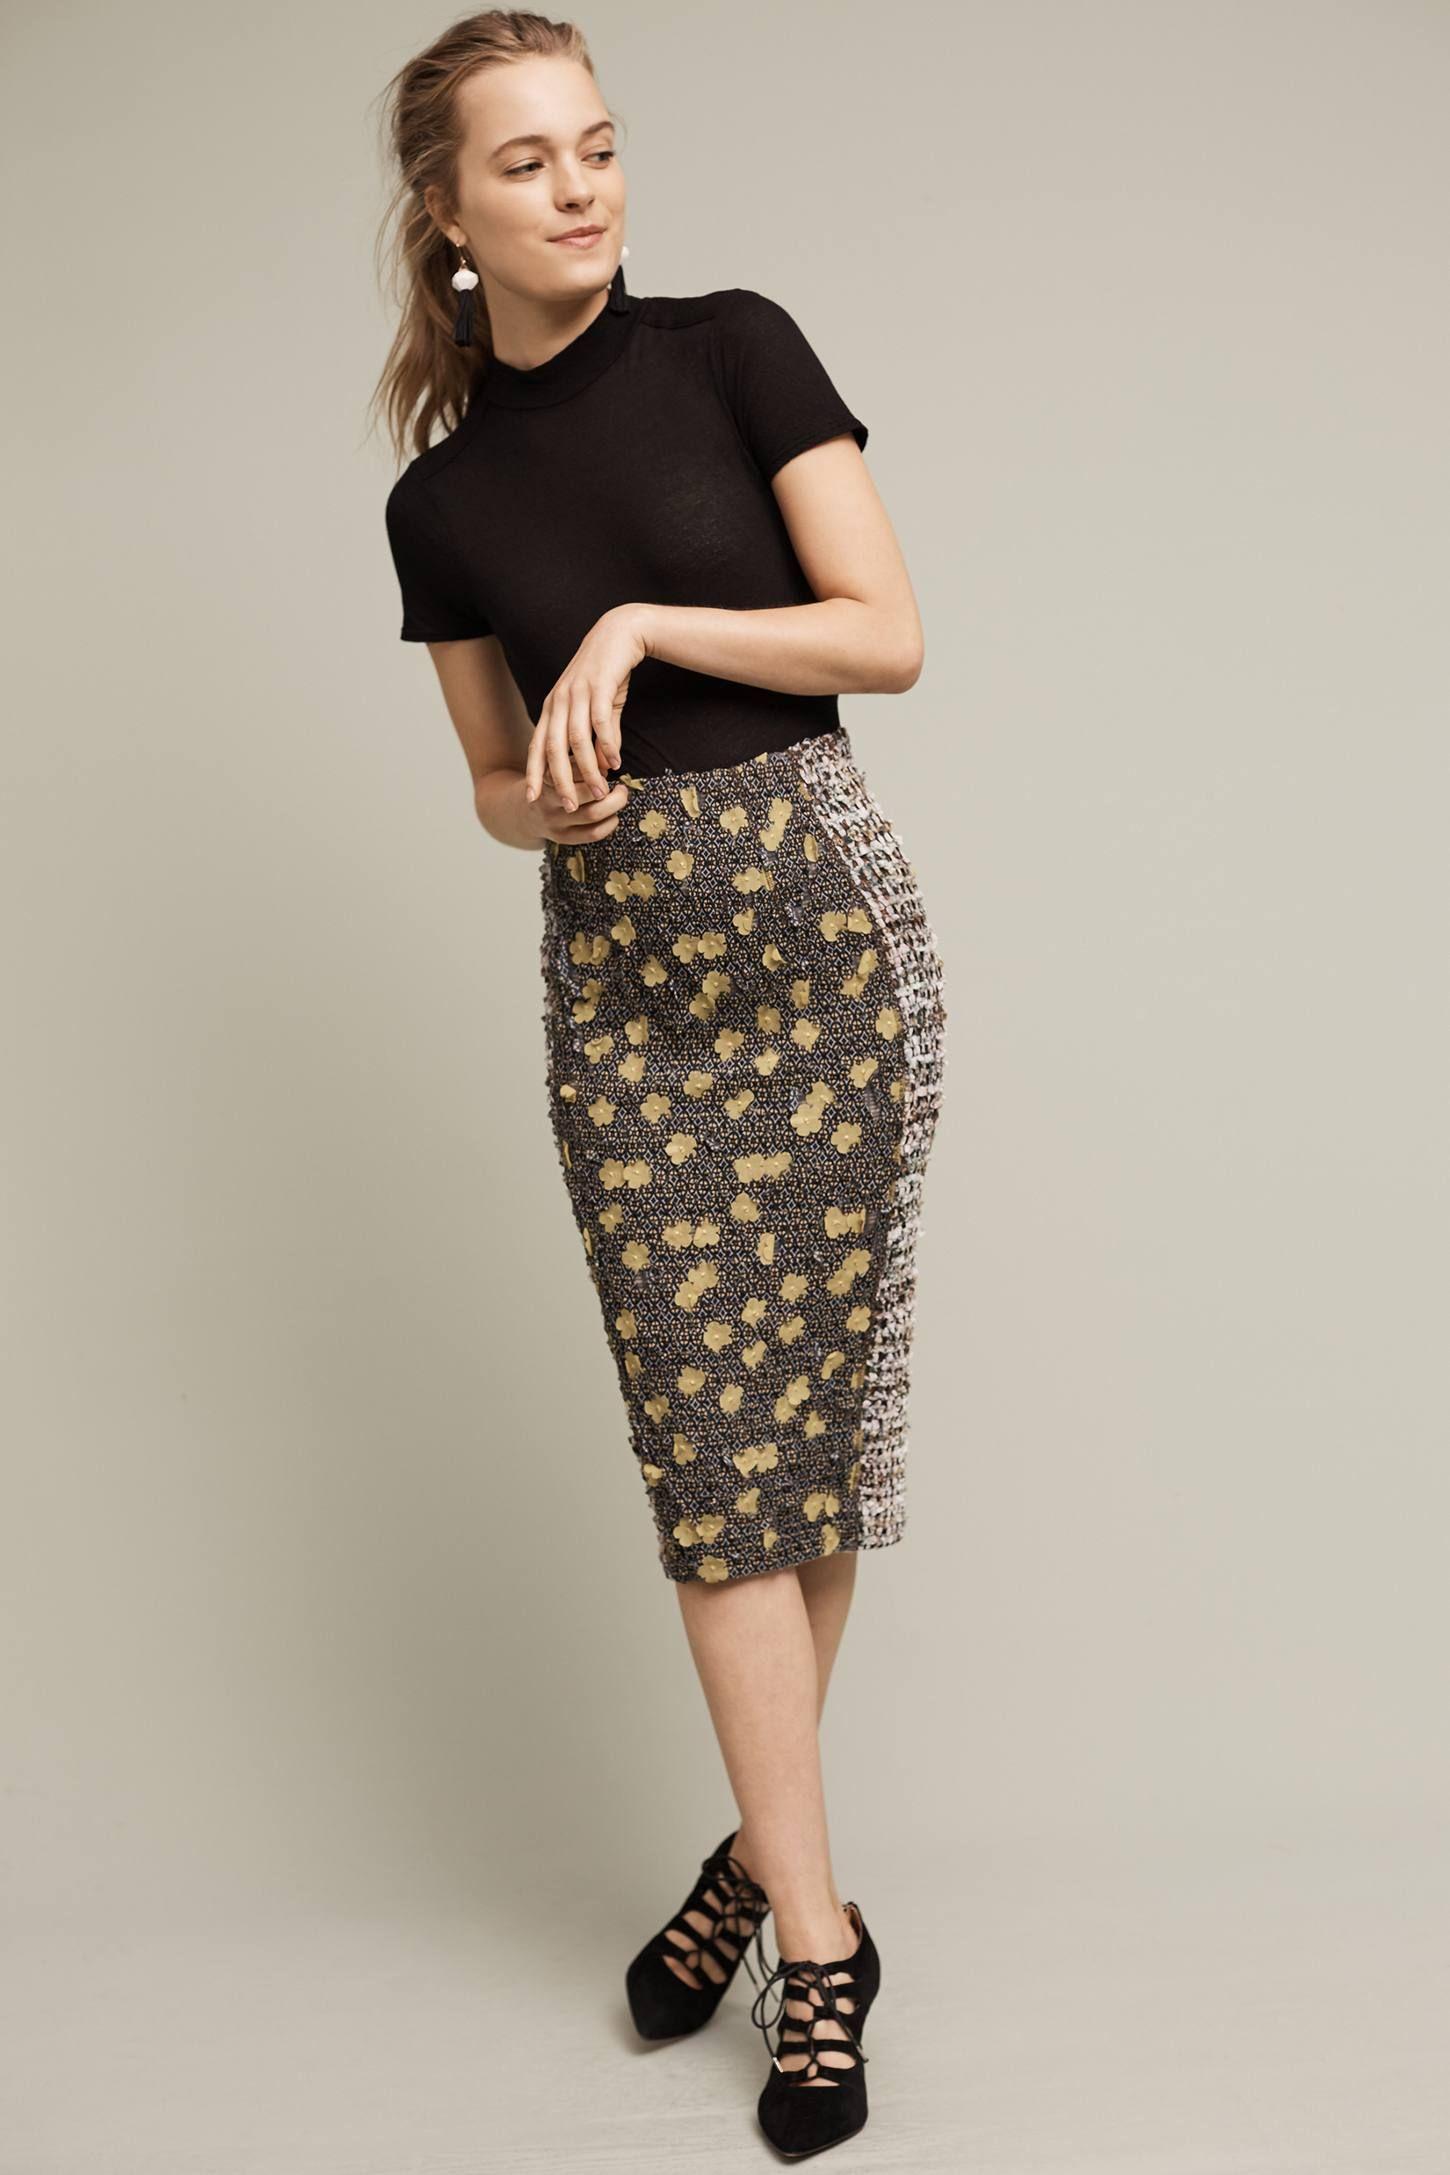 Poppies Pencil Skirt